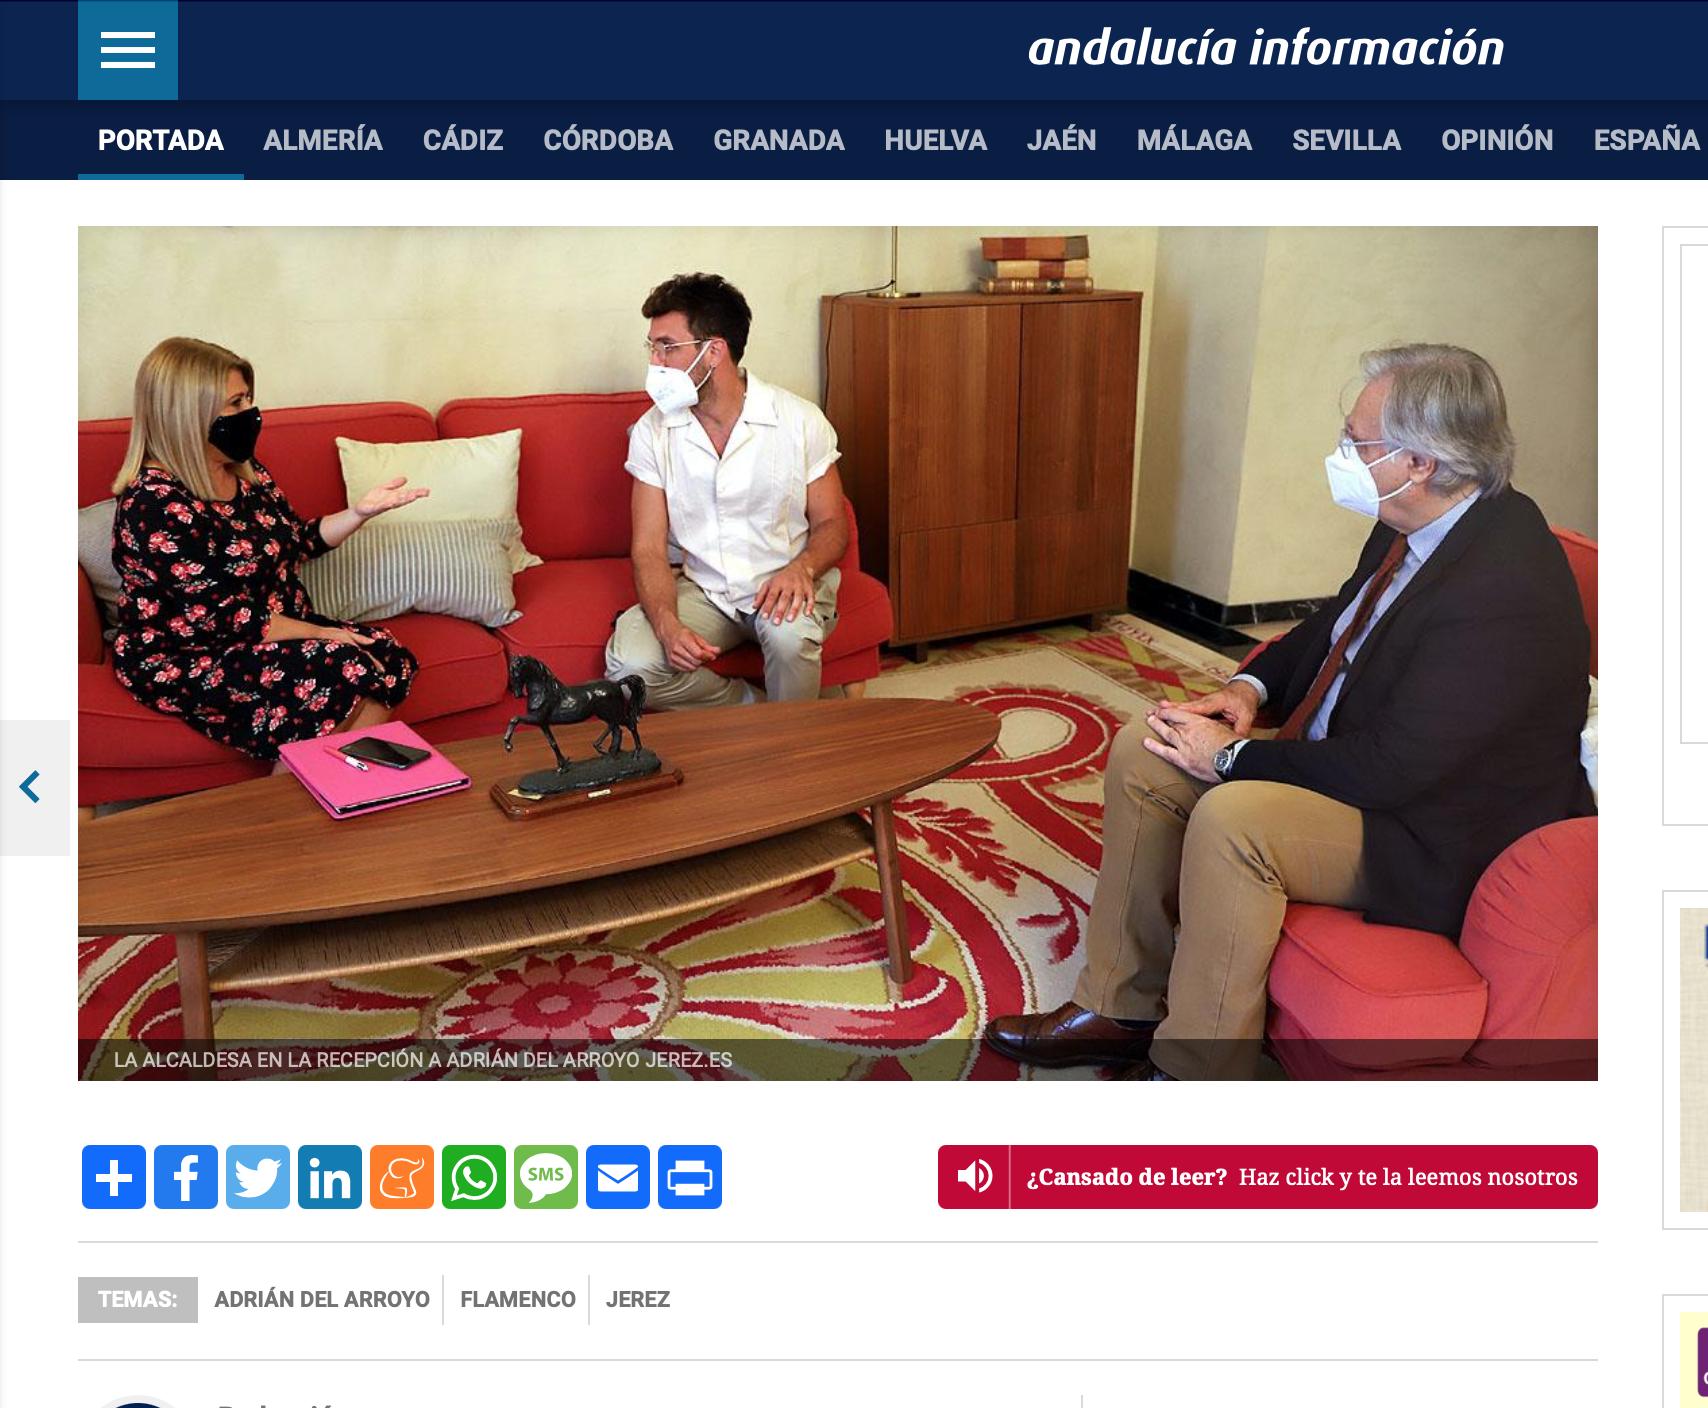 Andalucia 2 Screenshot 2021-05-02 at 19.51.00